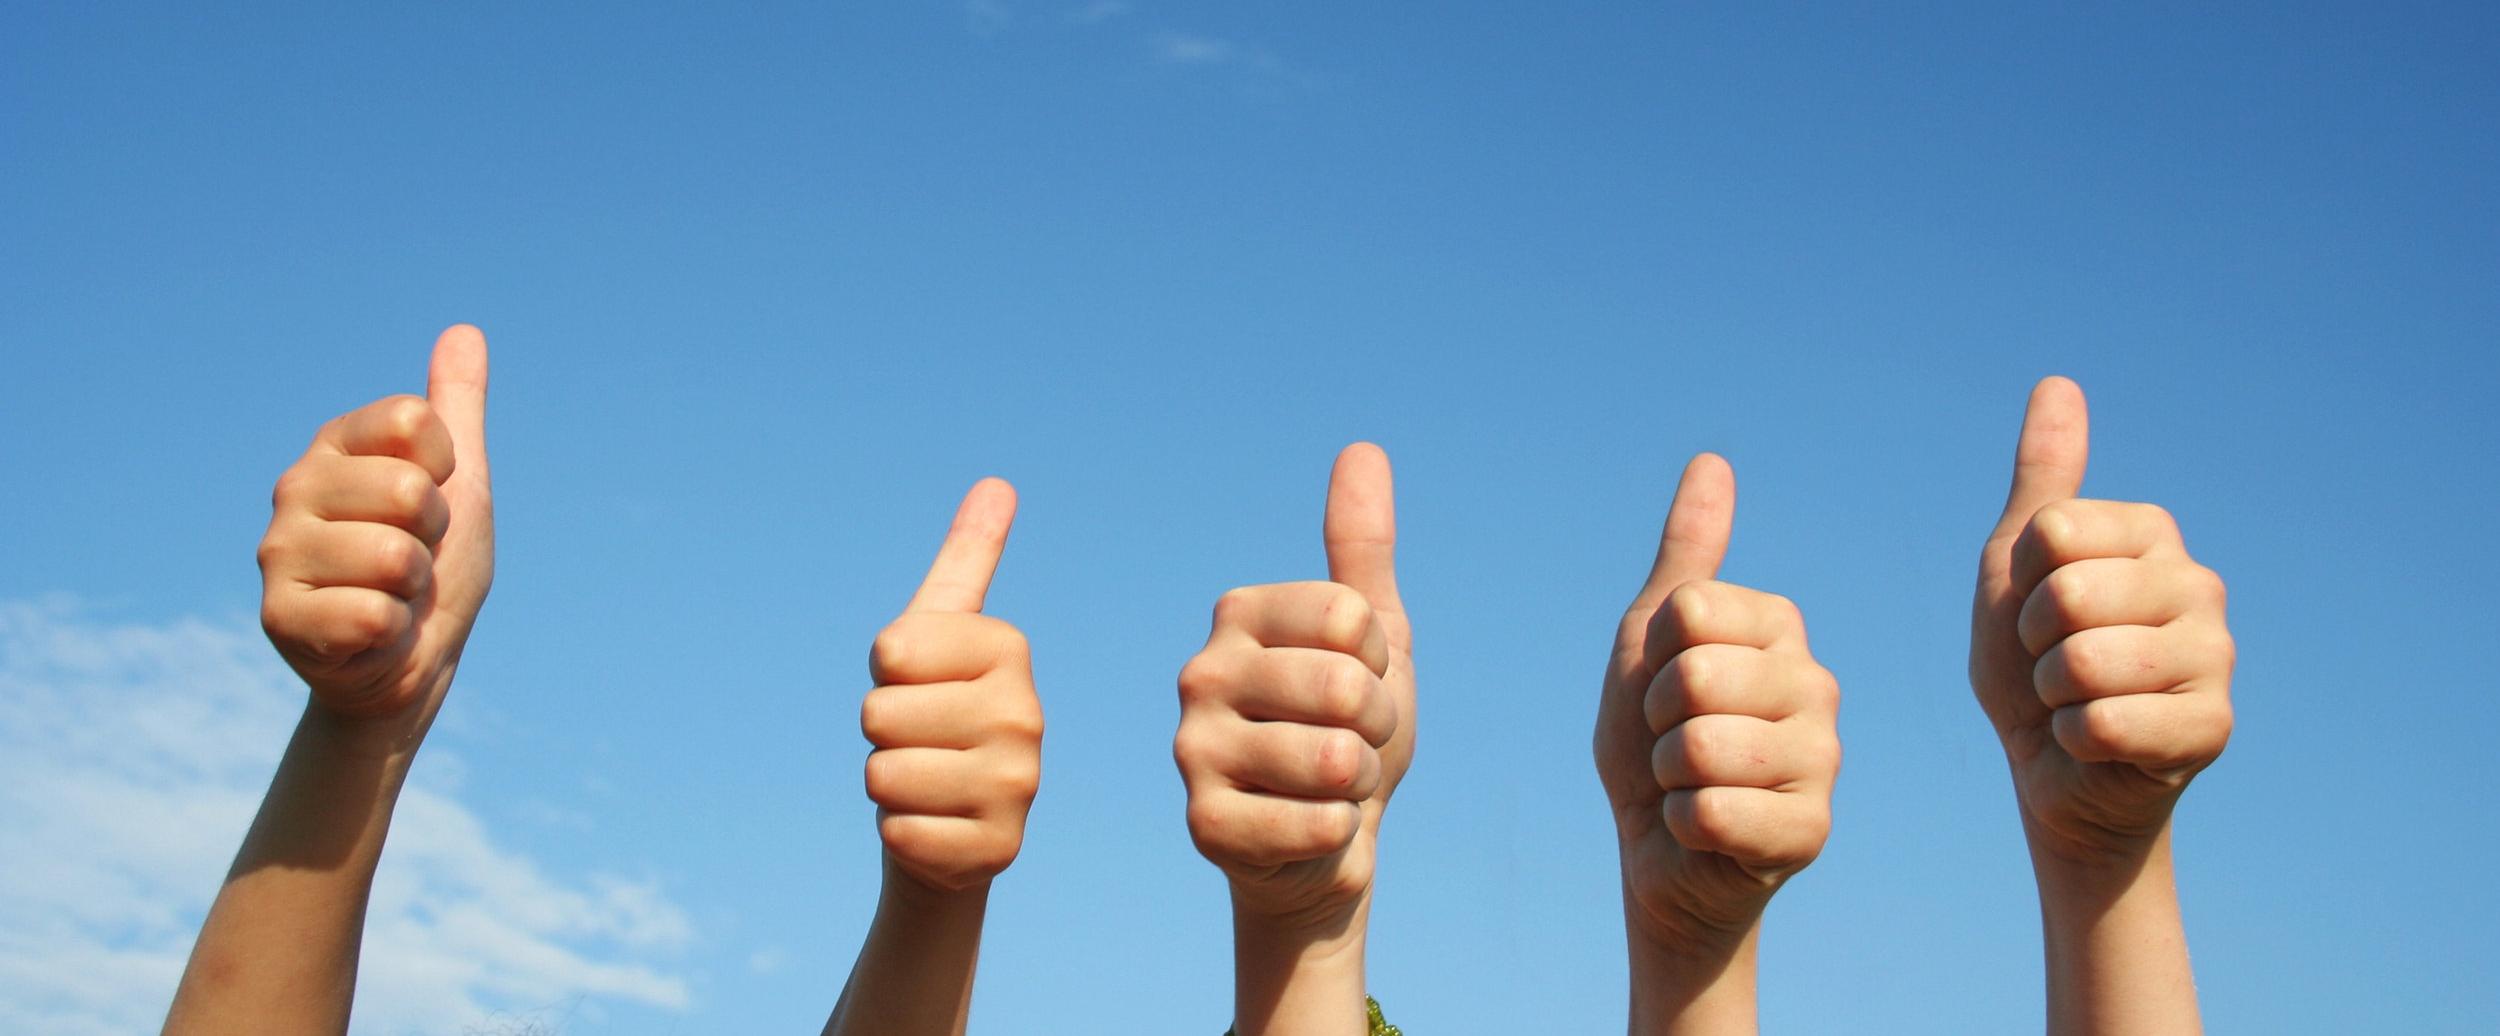 bigstock-Hands-giving-a-thumbs-up-okay-19276811.jpg